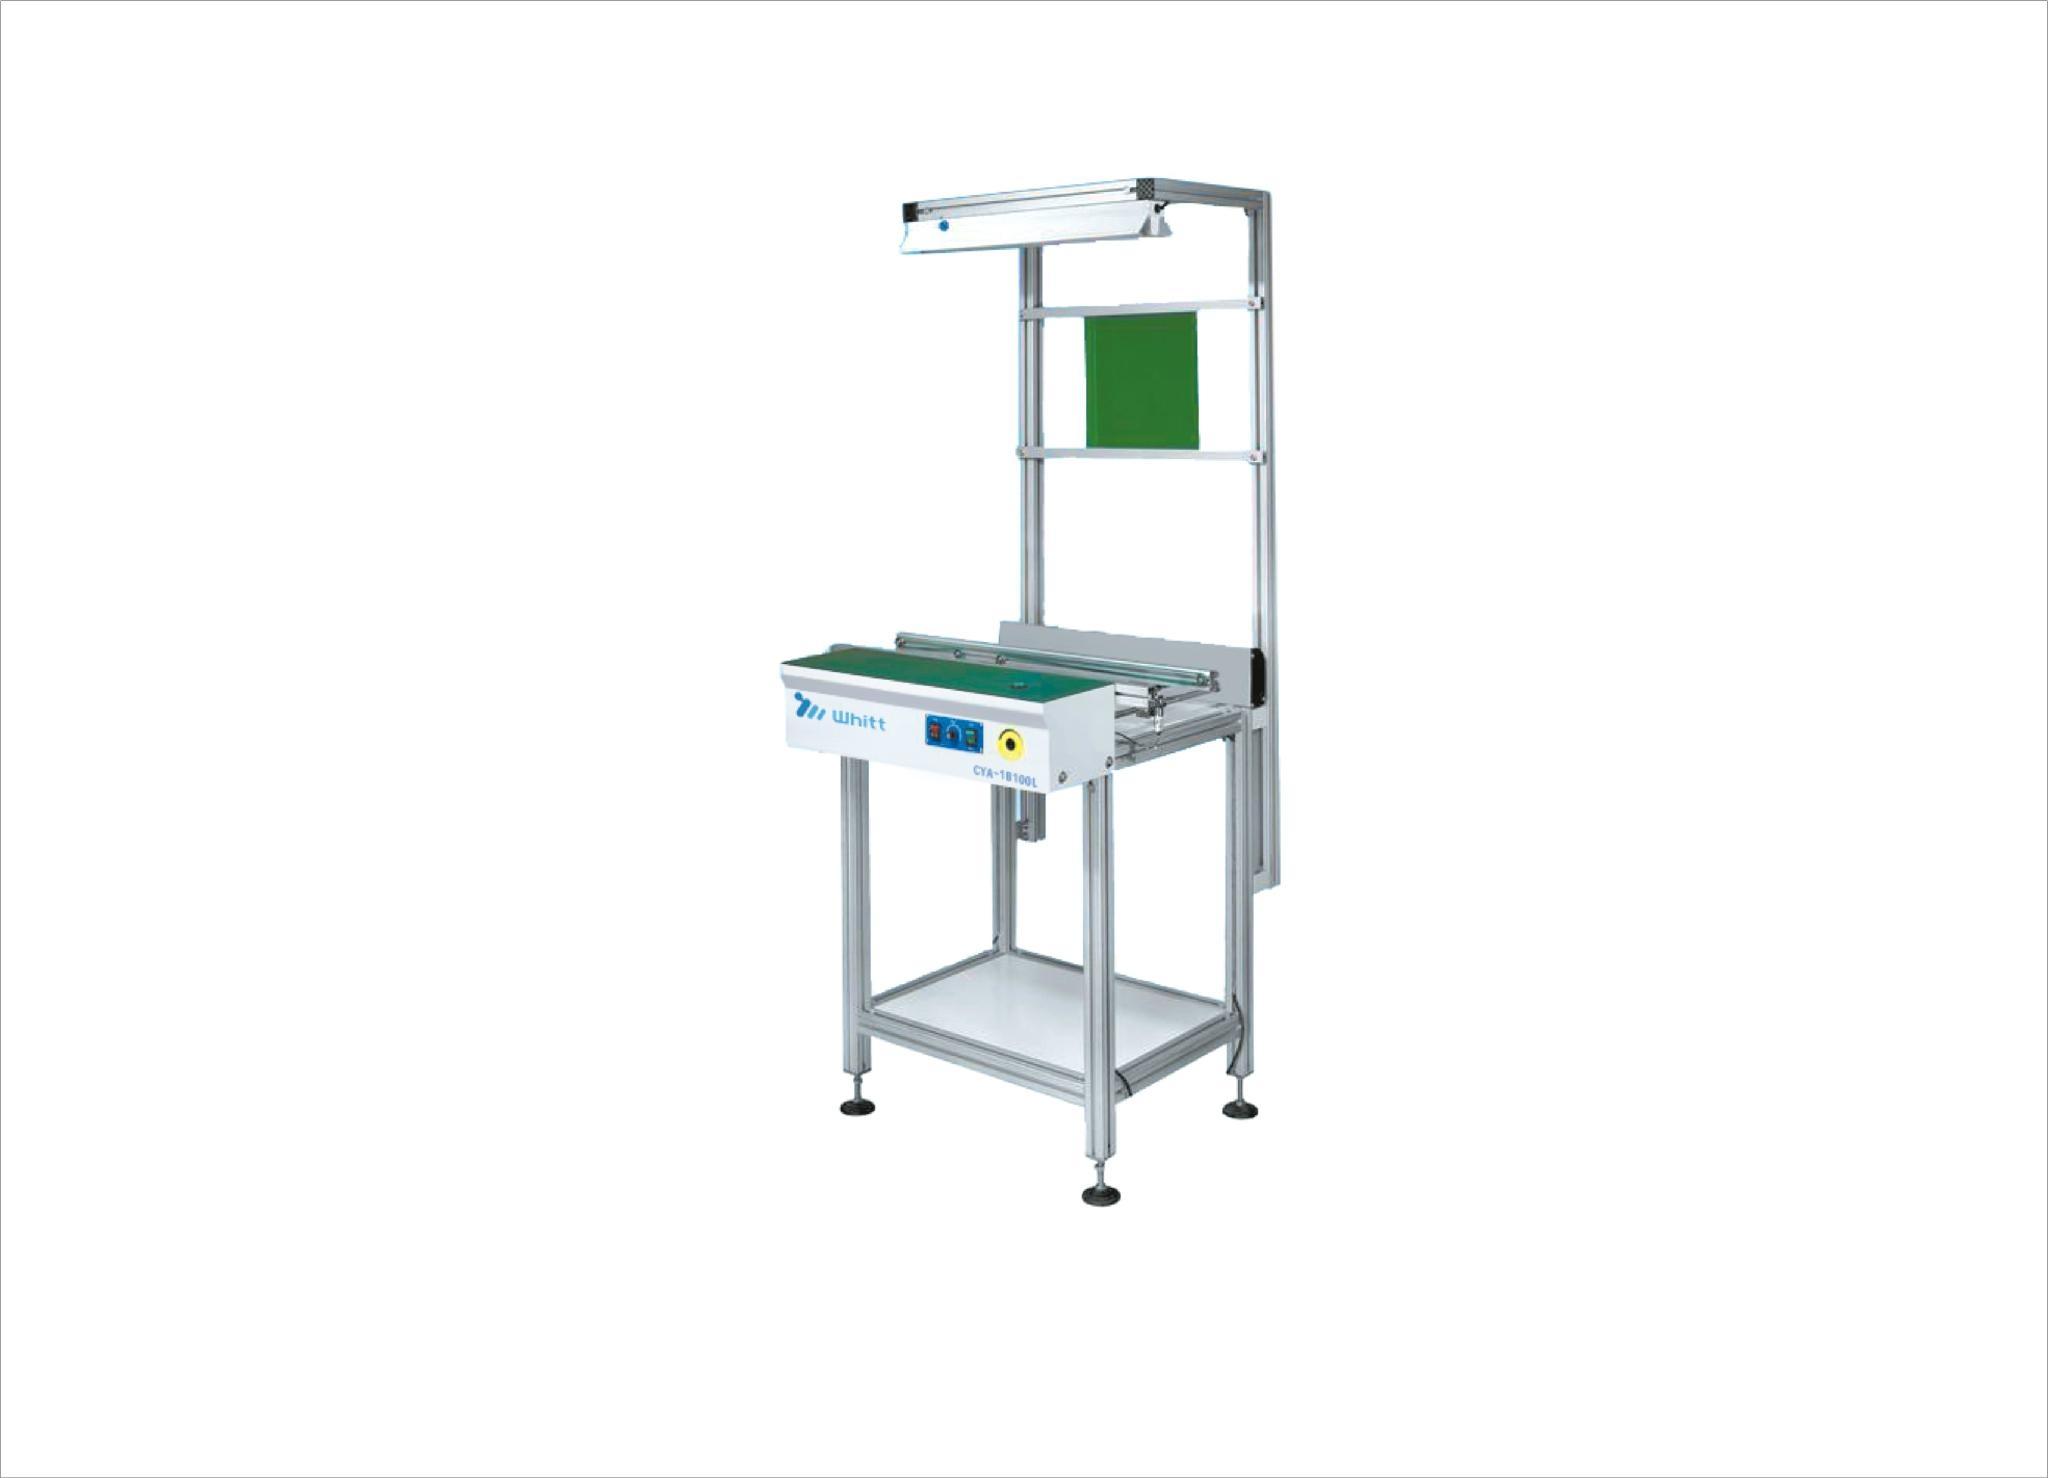 Whitt SMT 1.0m Inspection Conveyor 2